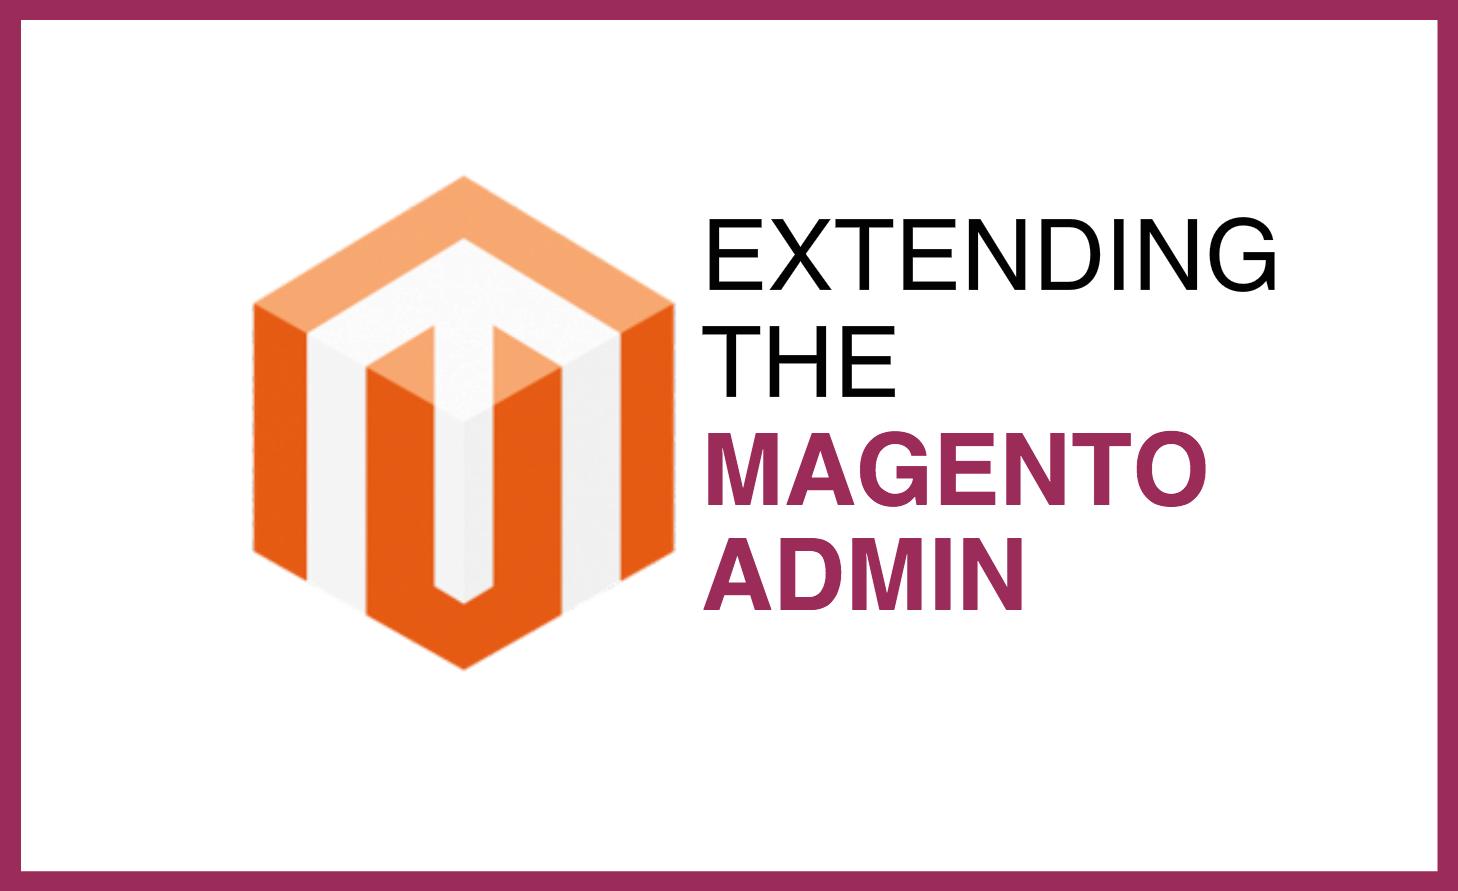 extending magento admin.png